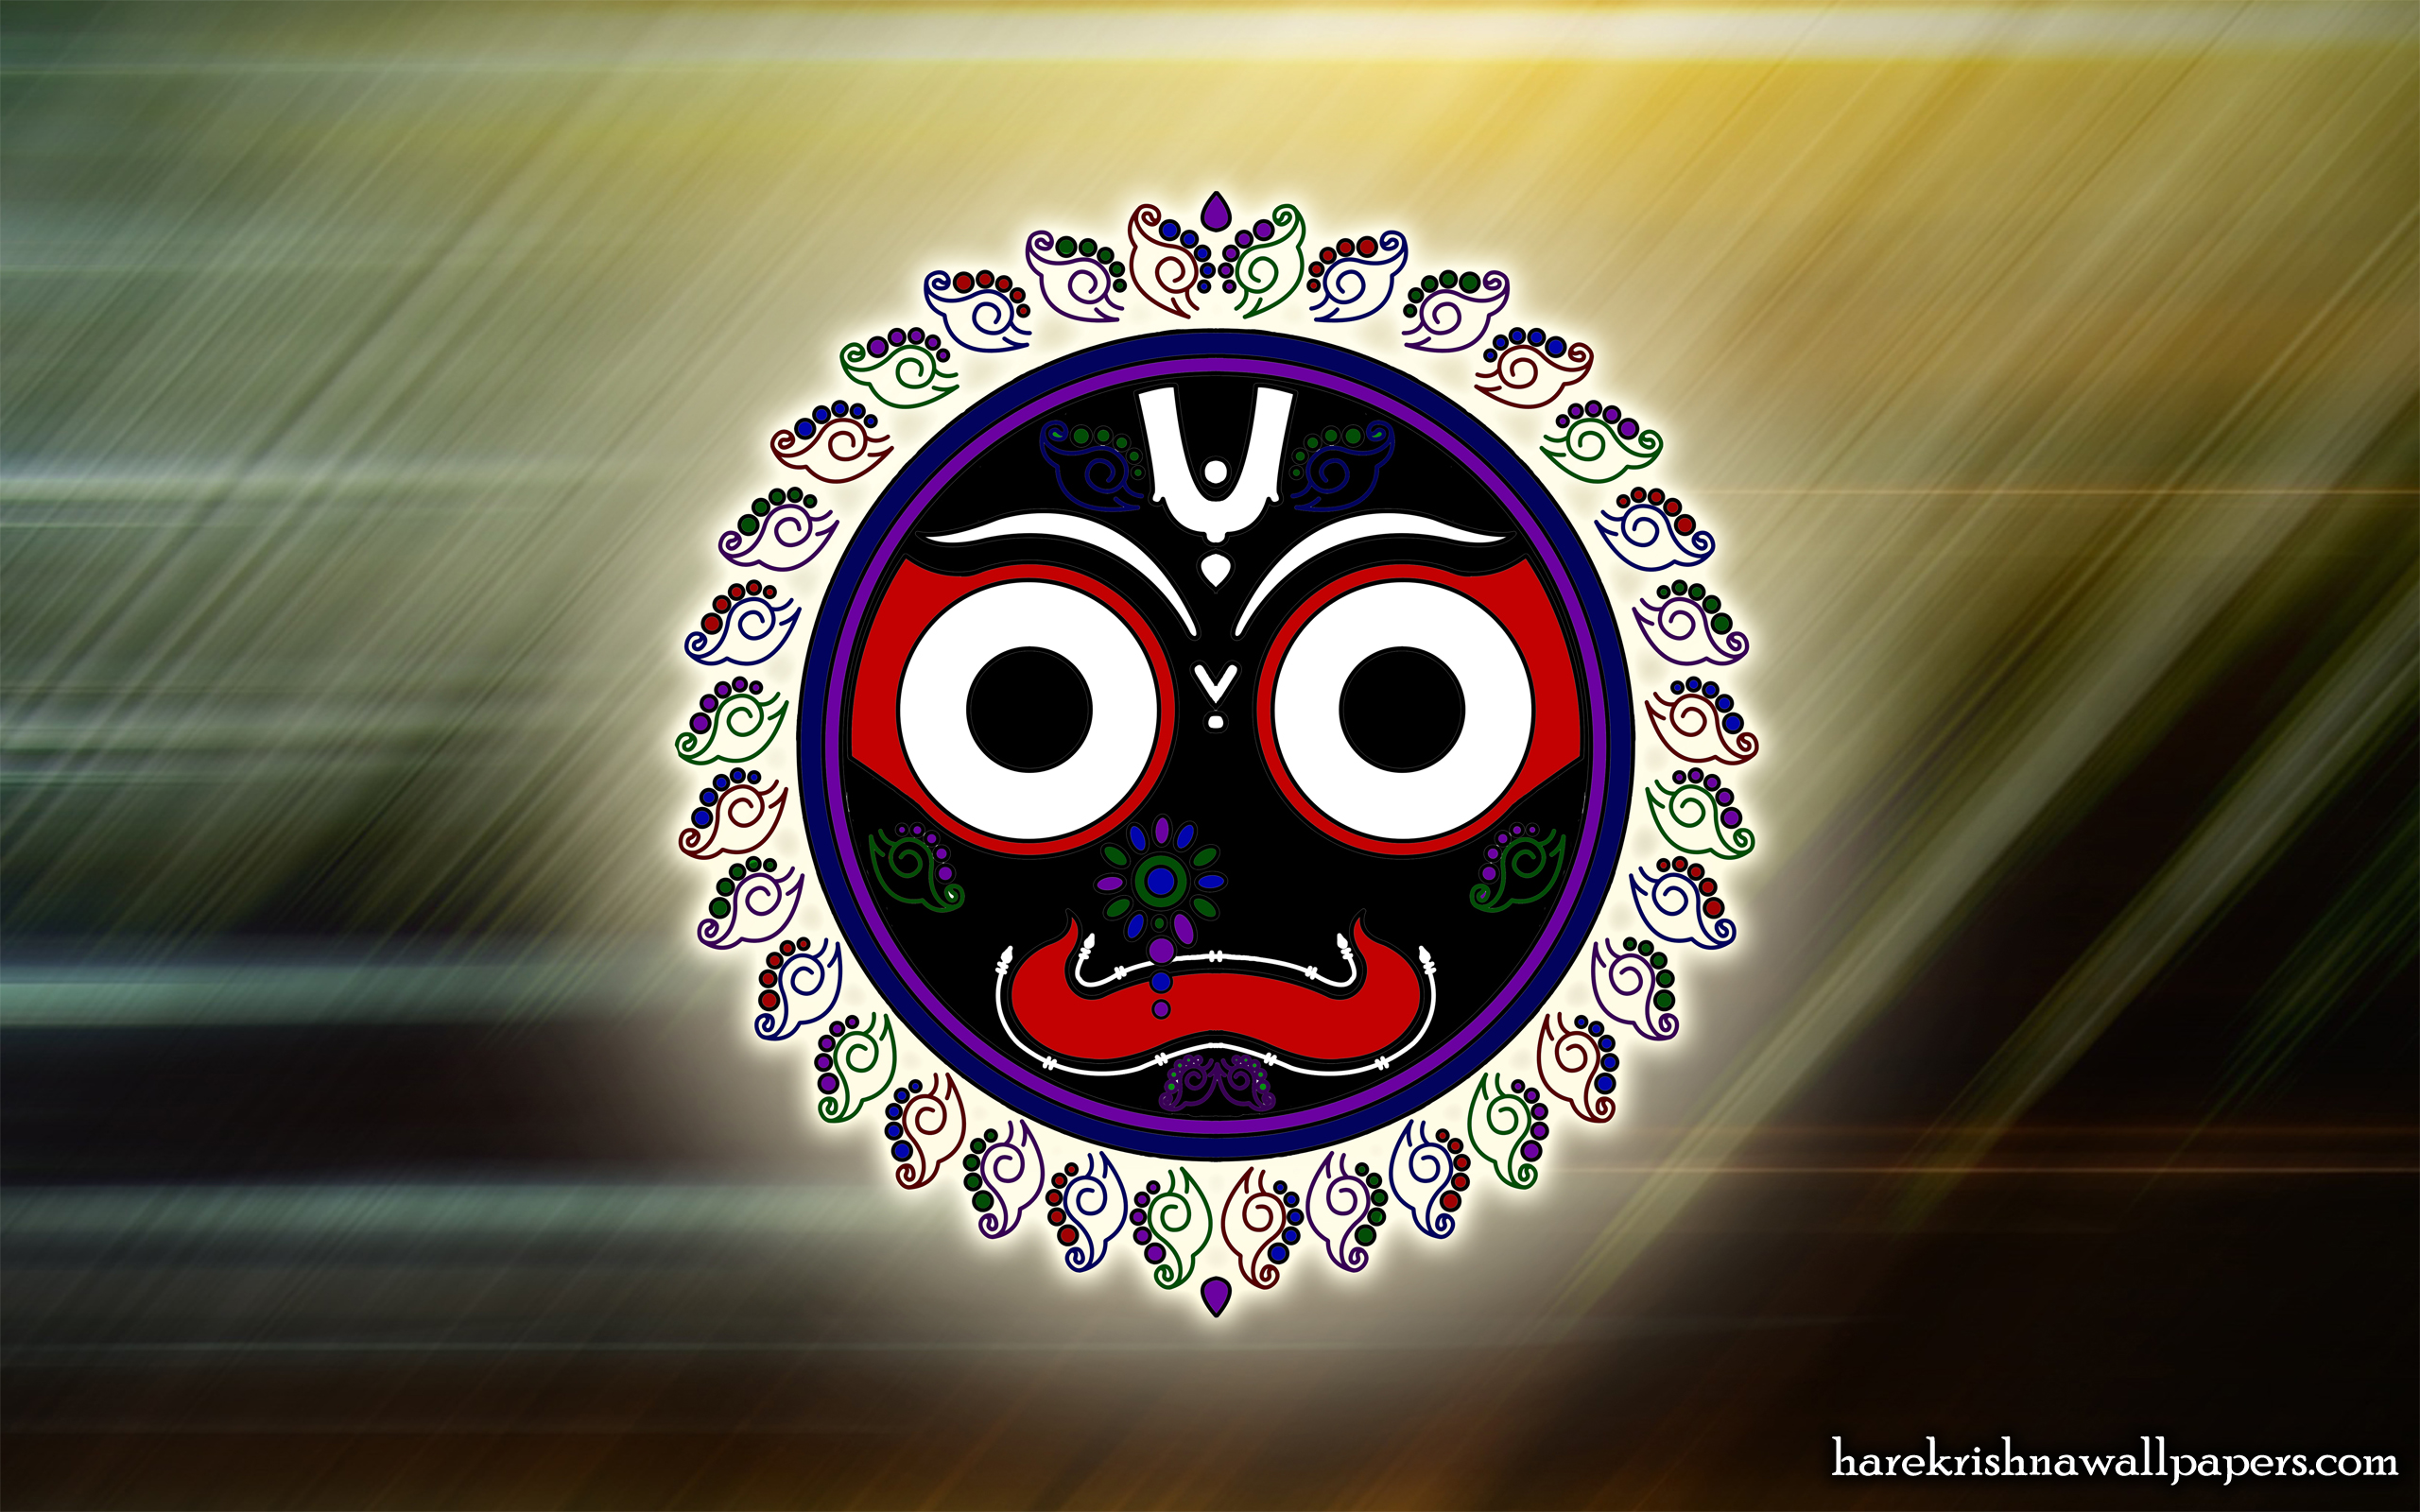 Jai Jagannath Wallpaper (037) Size 2560x1600 Download